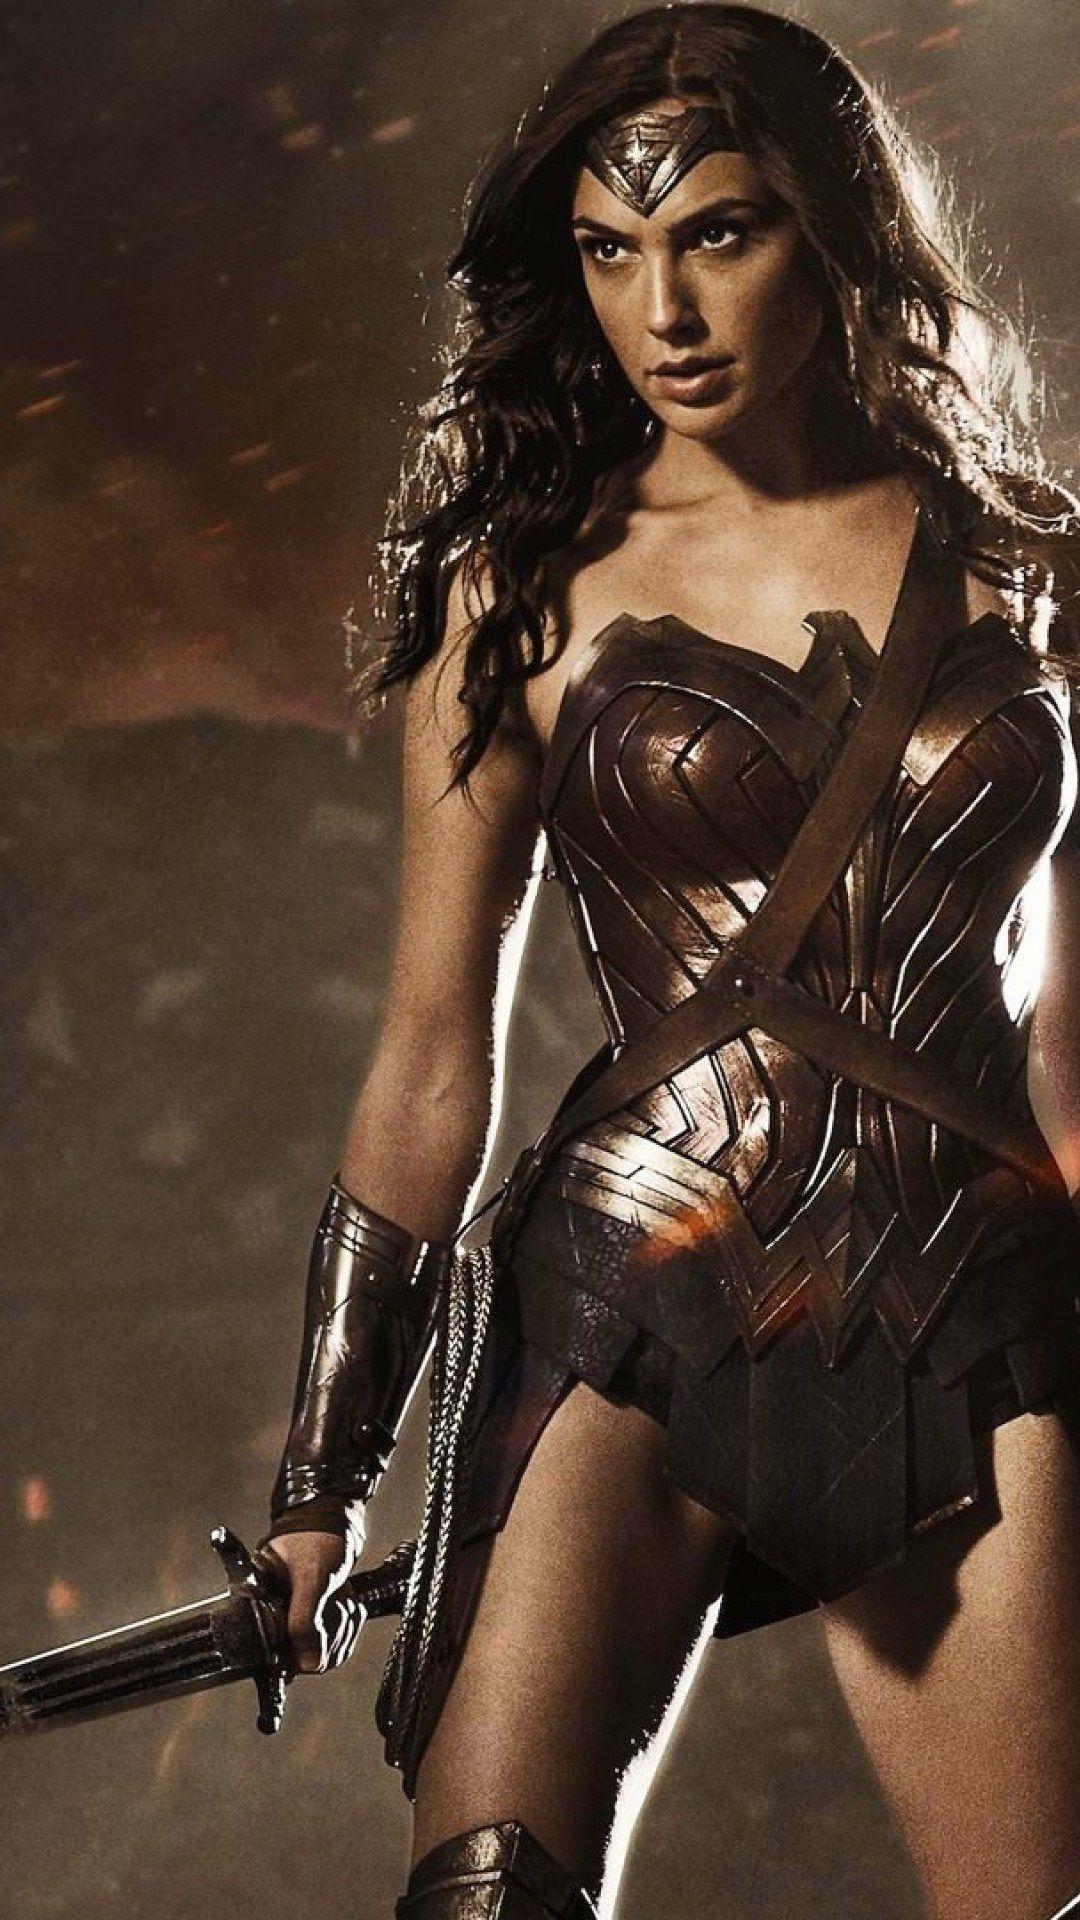 Hot Wonder Women Movie Wallpaper Gal Gadot Wonder Woman Wonder